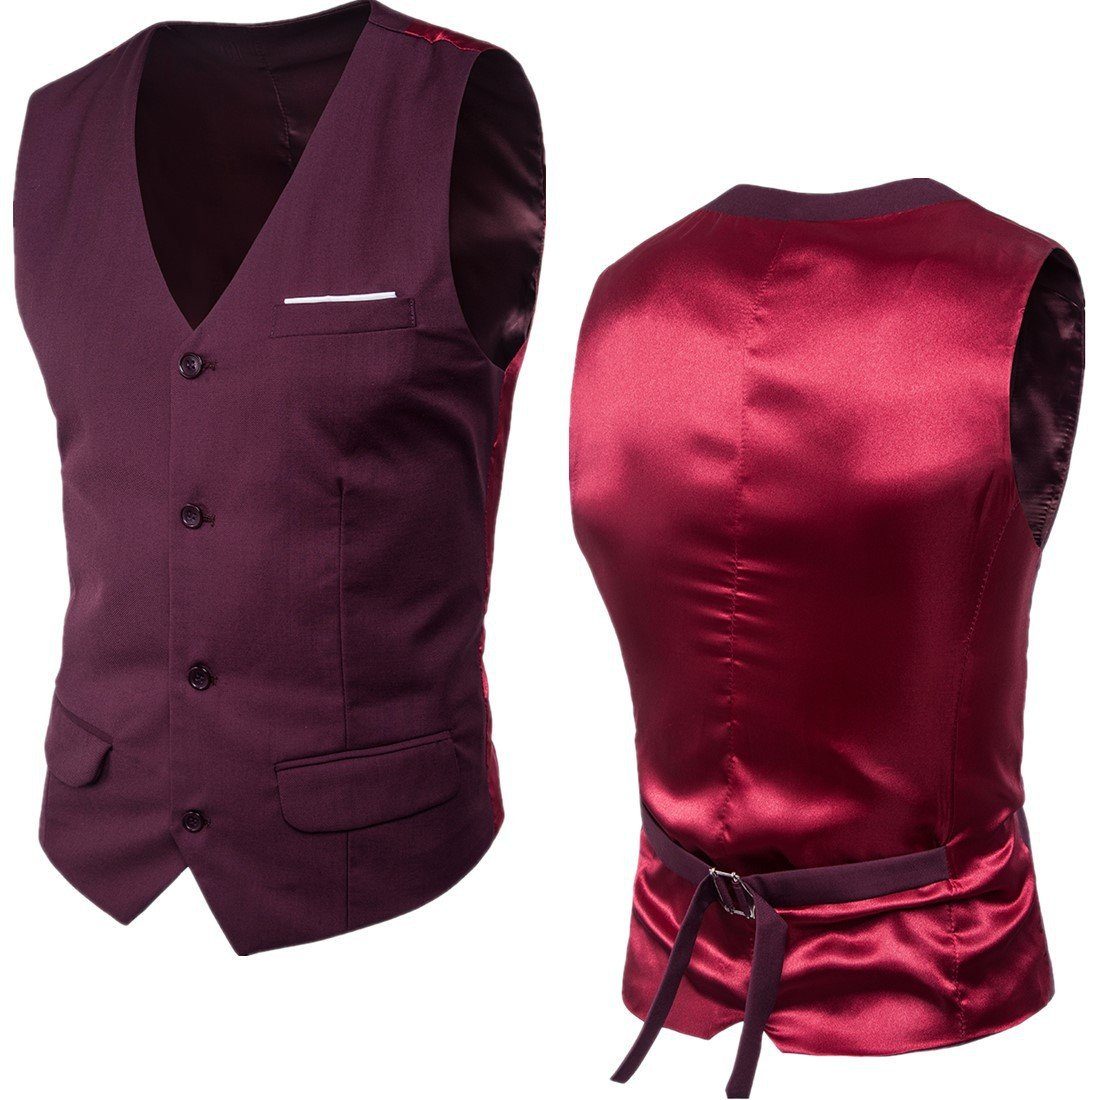 7dress Men's Slim Fit Suit Vests V-Neck Formal Business Sleeveless Dress Bridegroom Suit Separate Waistcoat